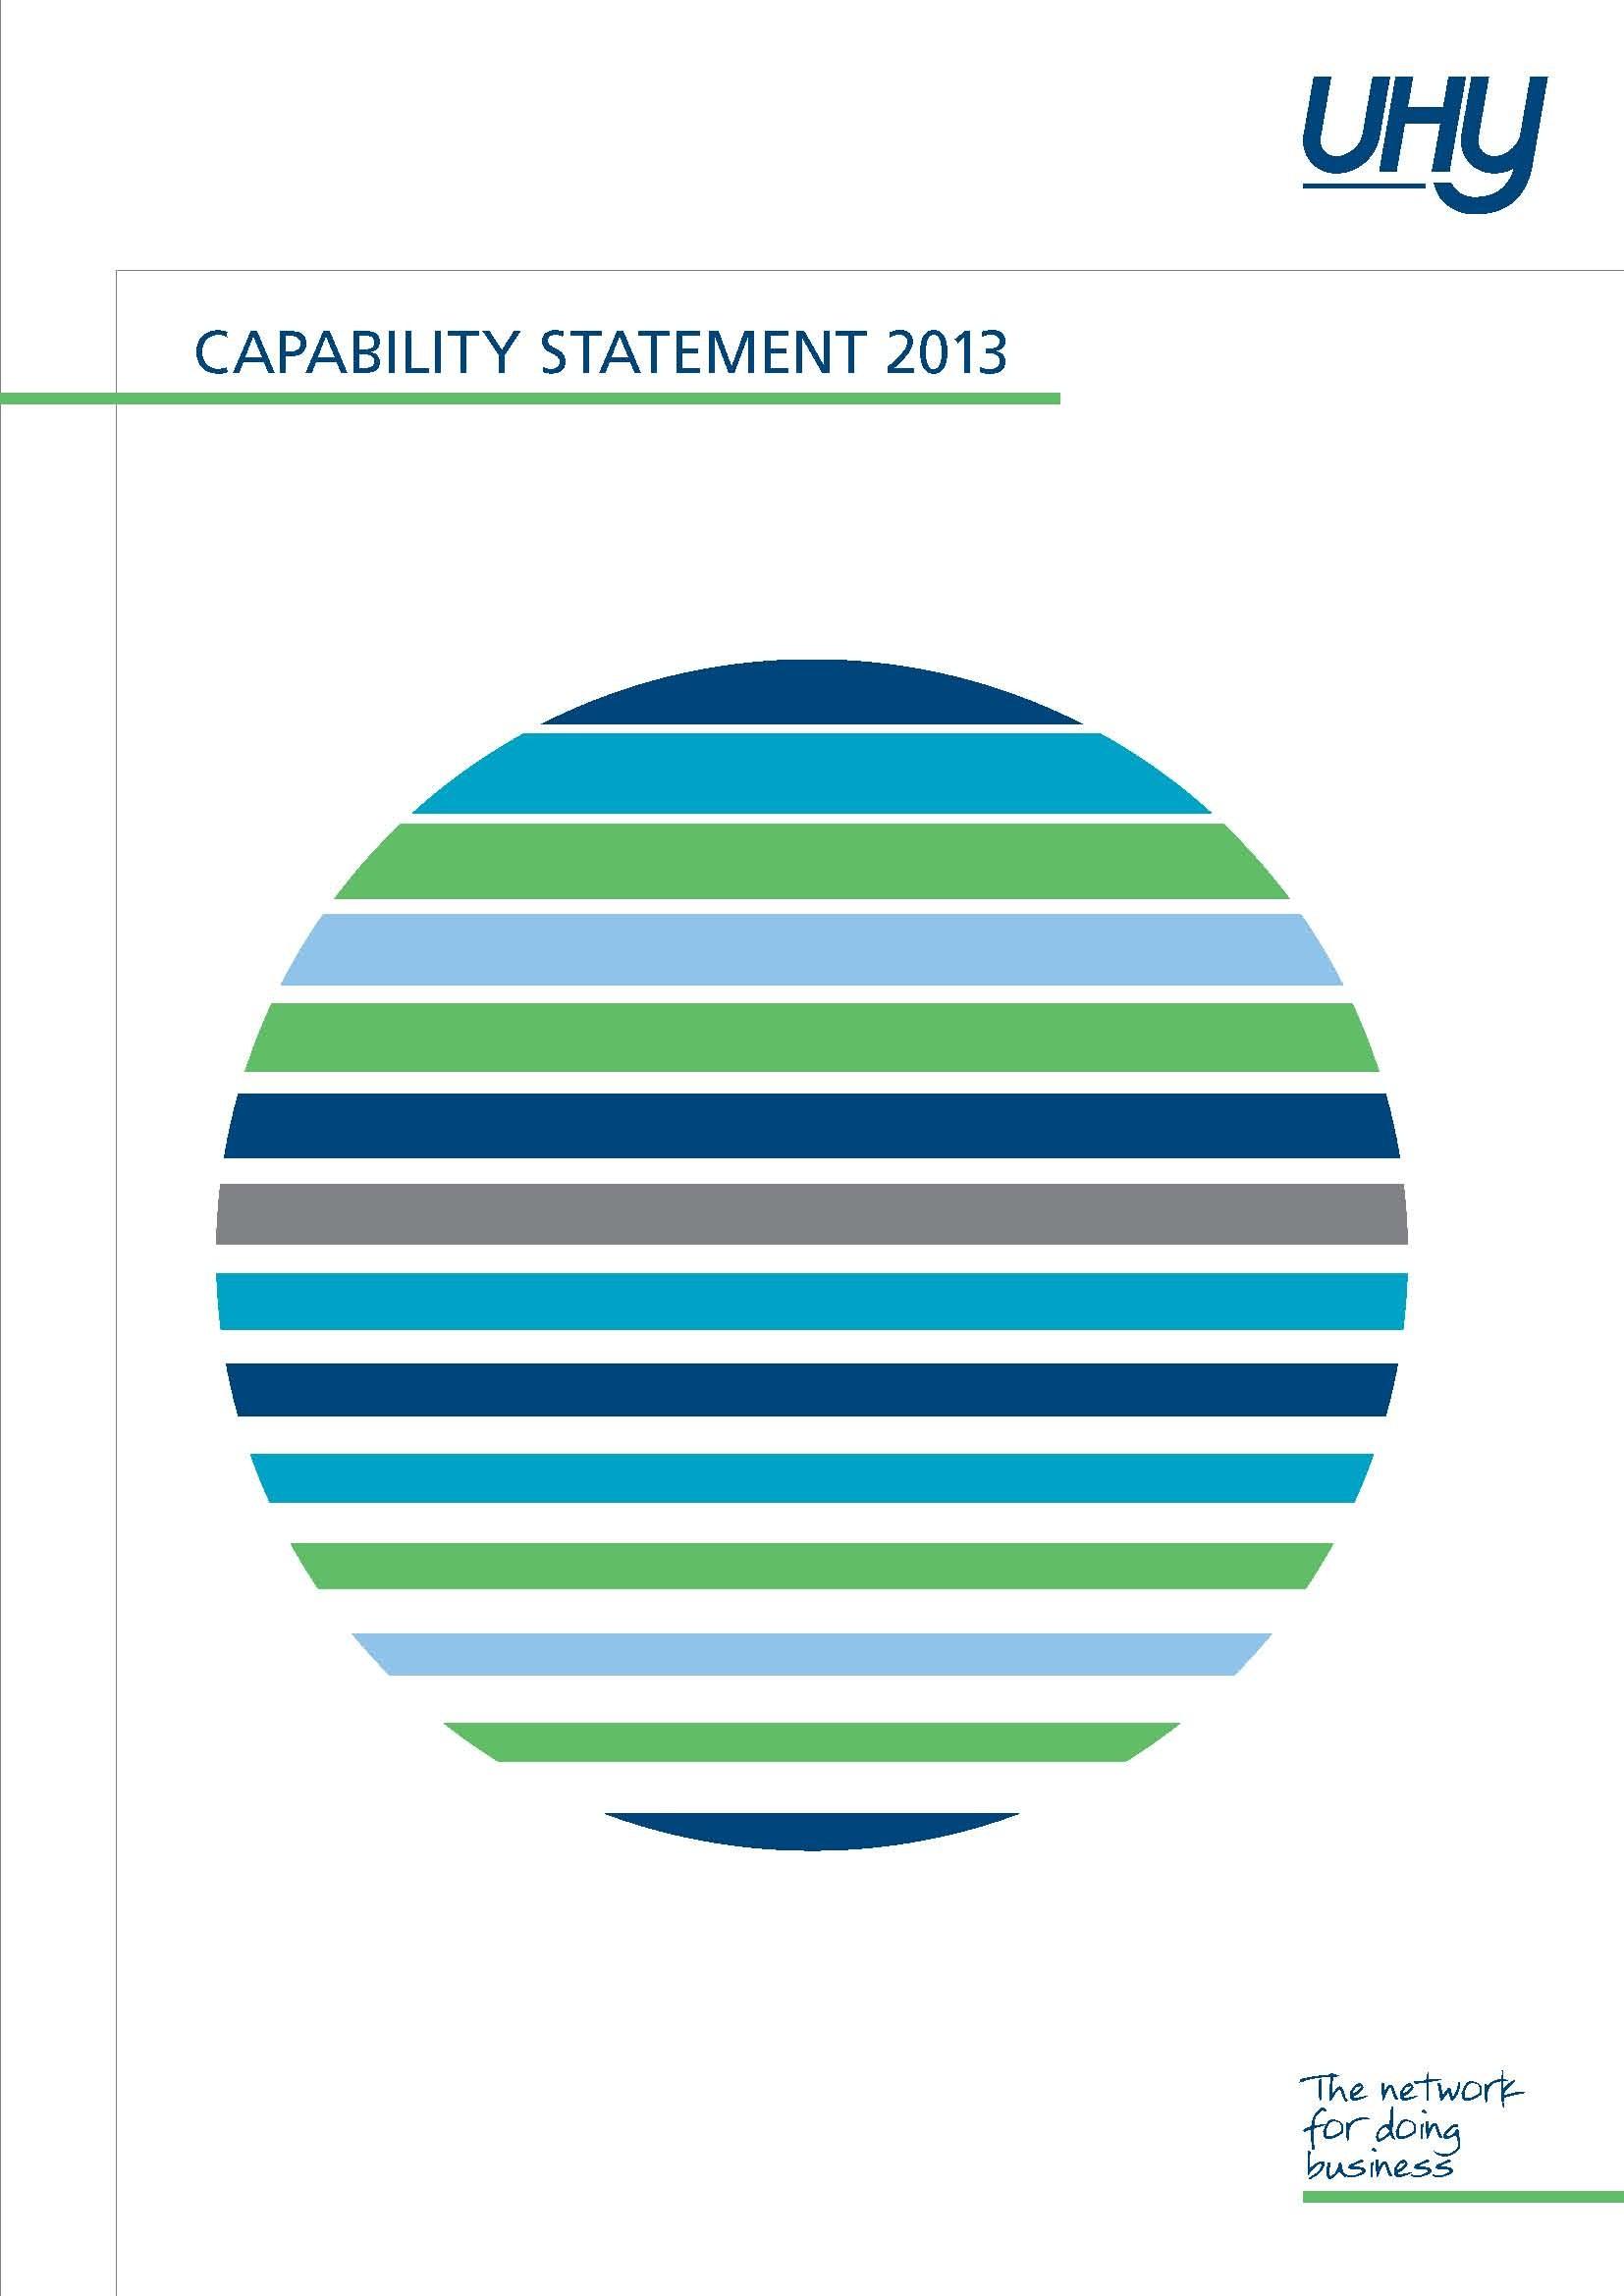 UHY Capability Statement 2013_p1